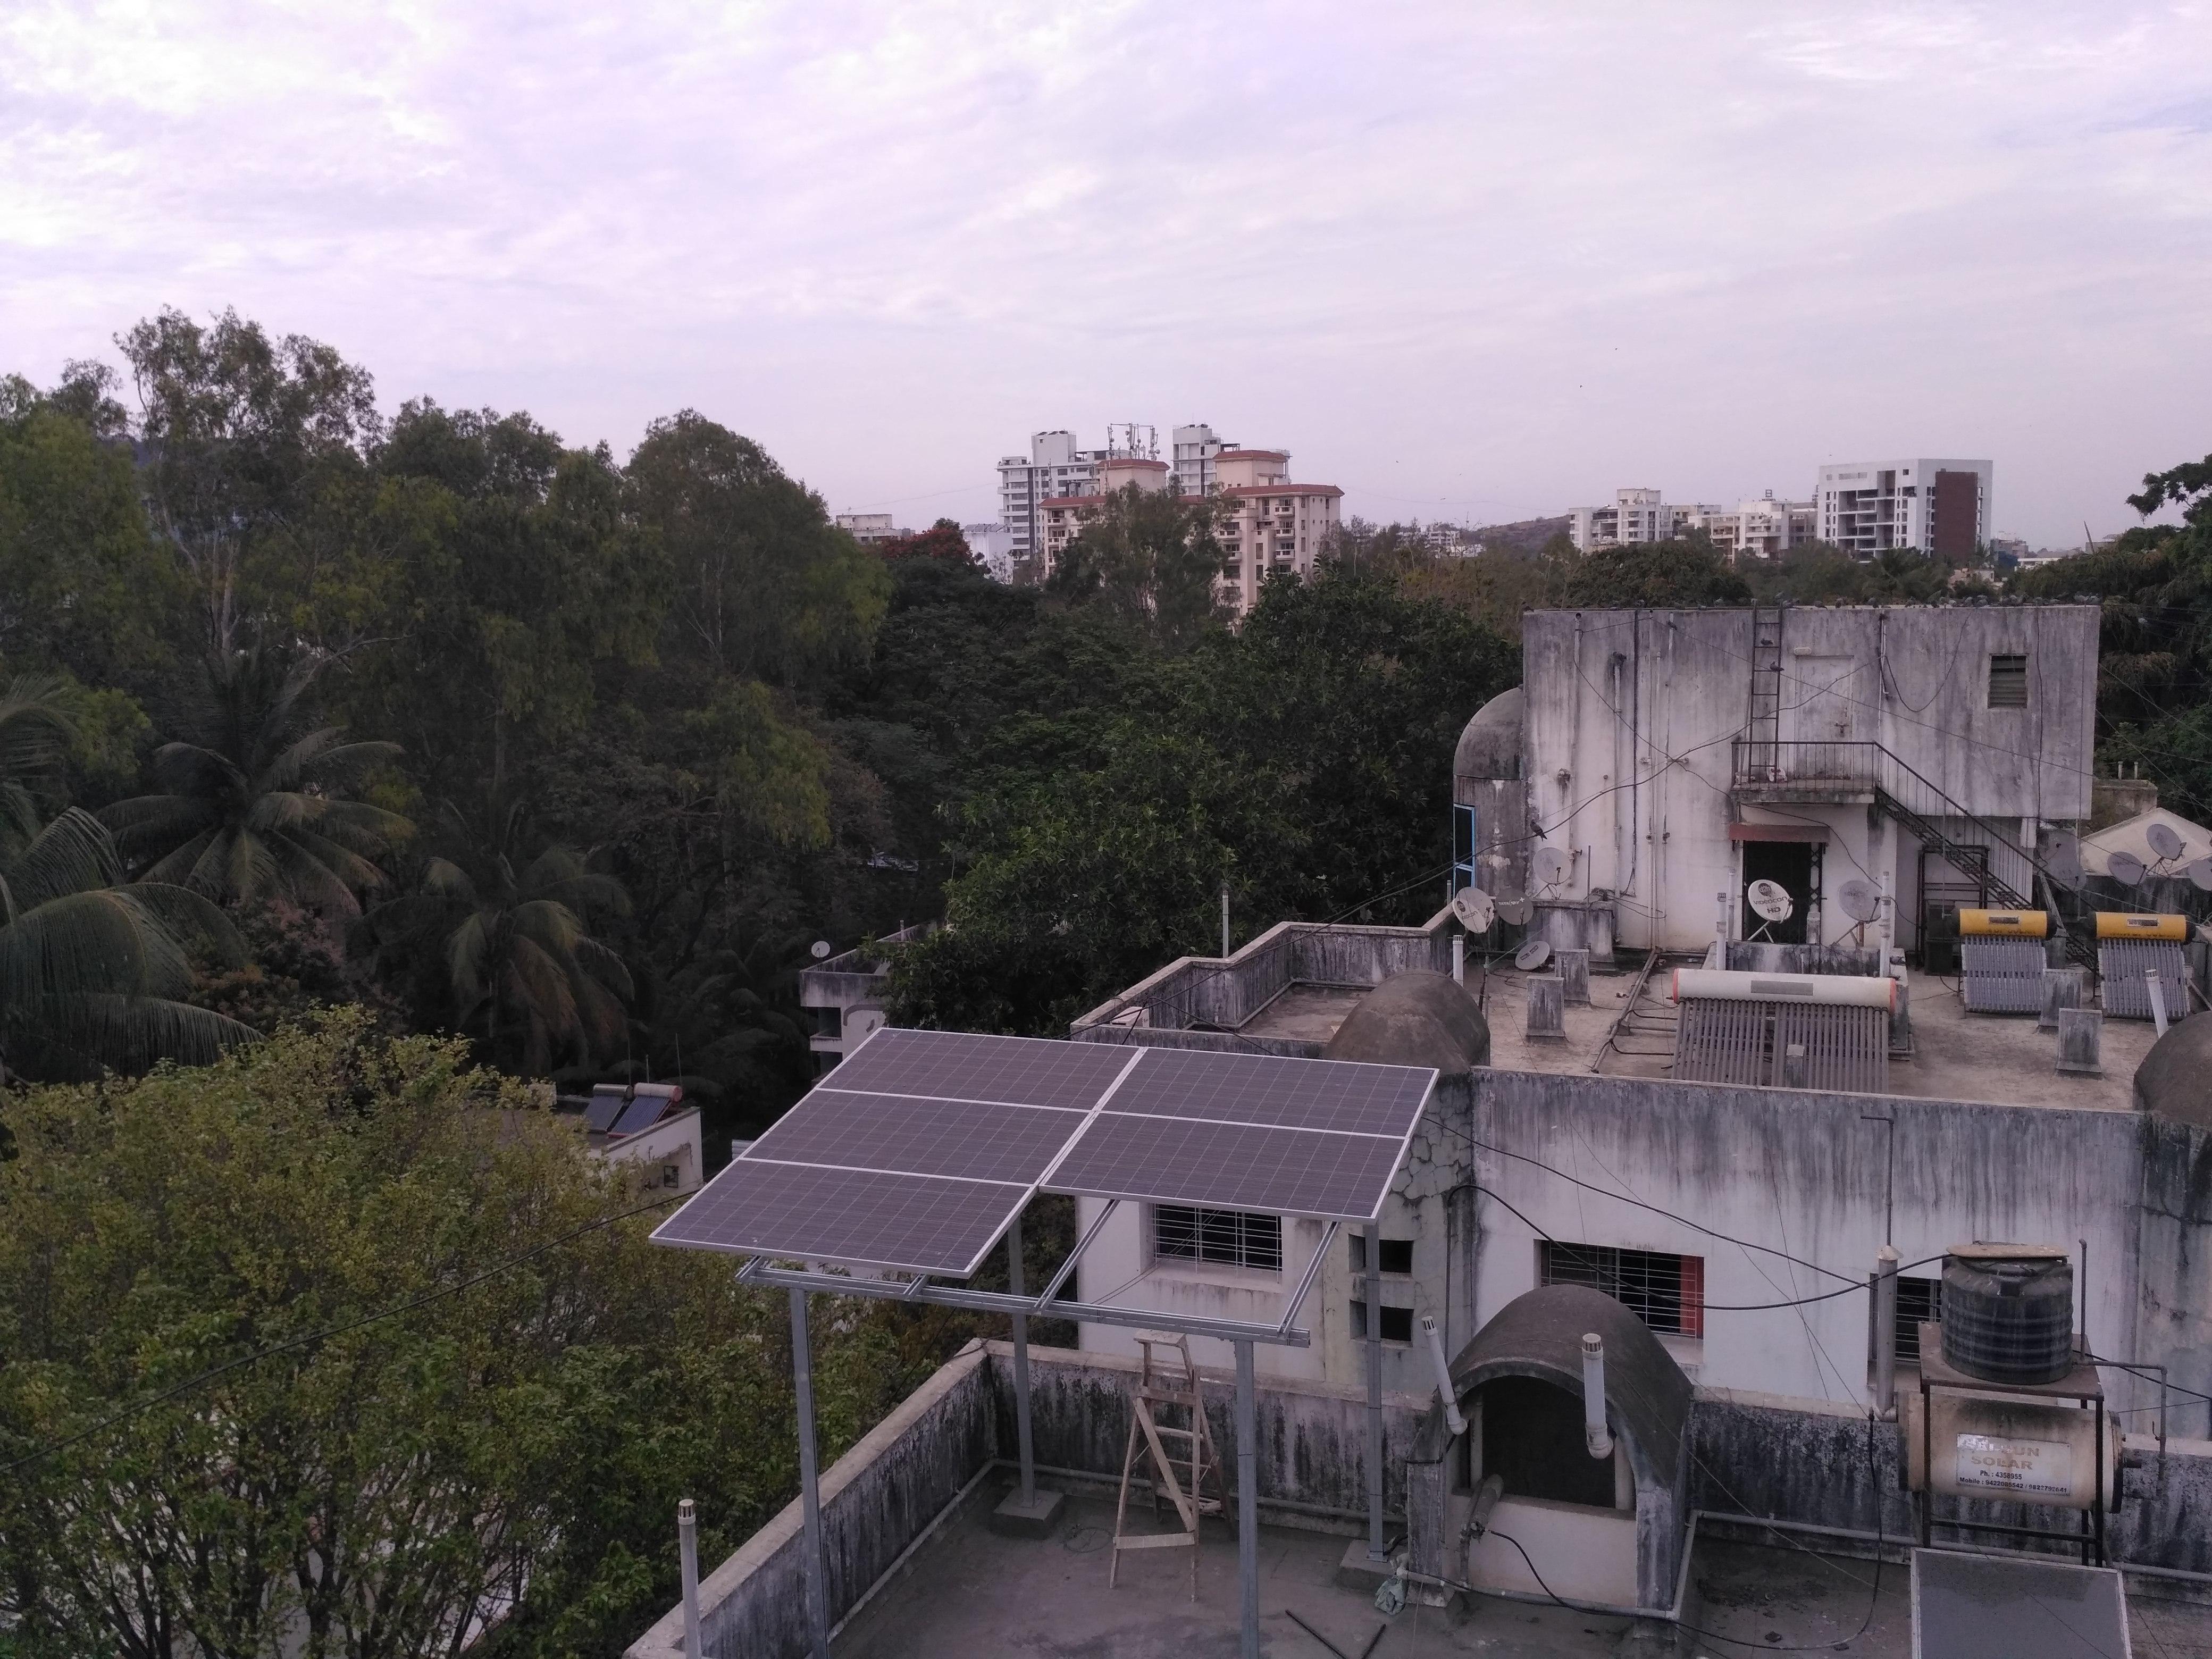 1.6KW- Mr. Mahesh Mehendale, Pune